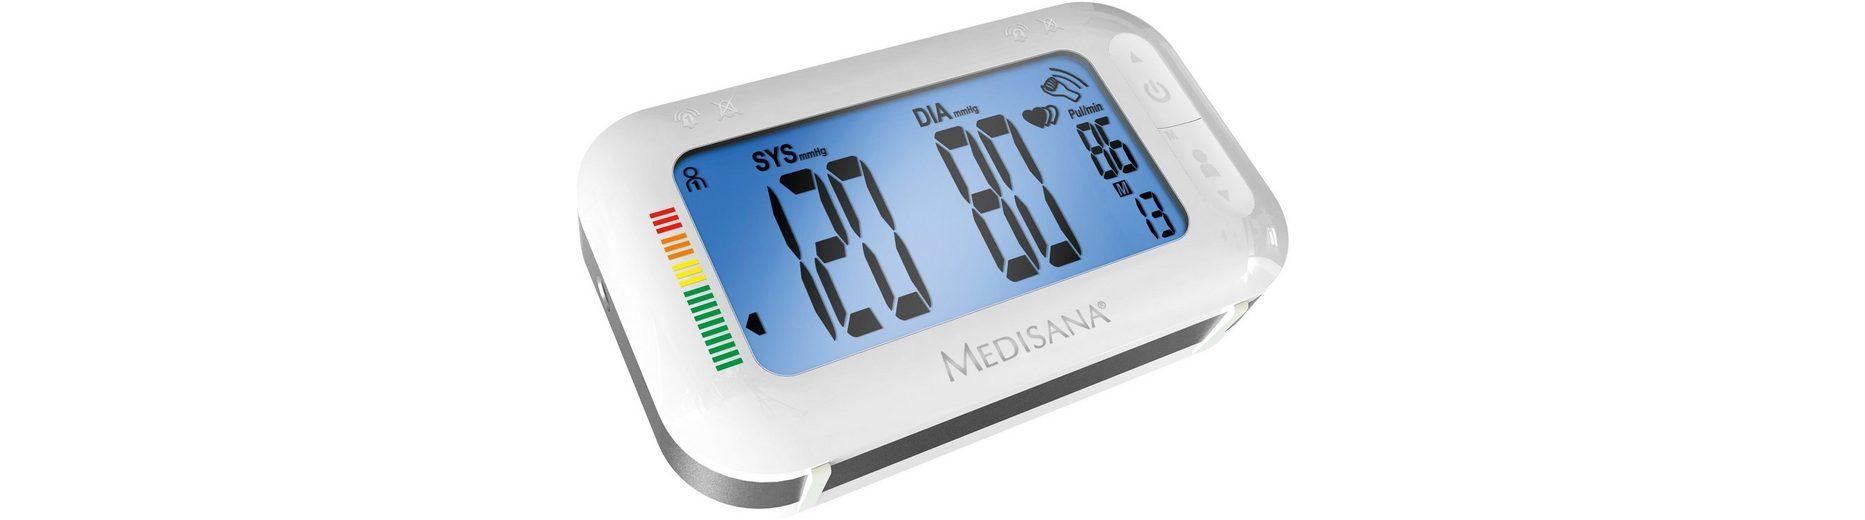 Medisana, Oberarm-Blutdruckmessgerät, M51296 BU 575 connect